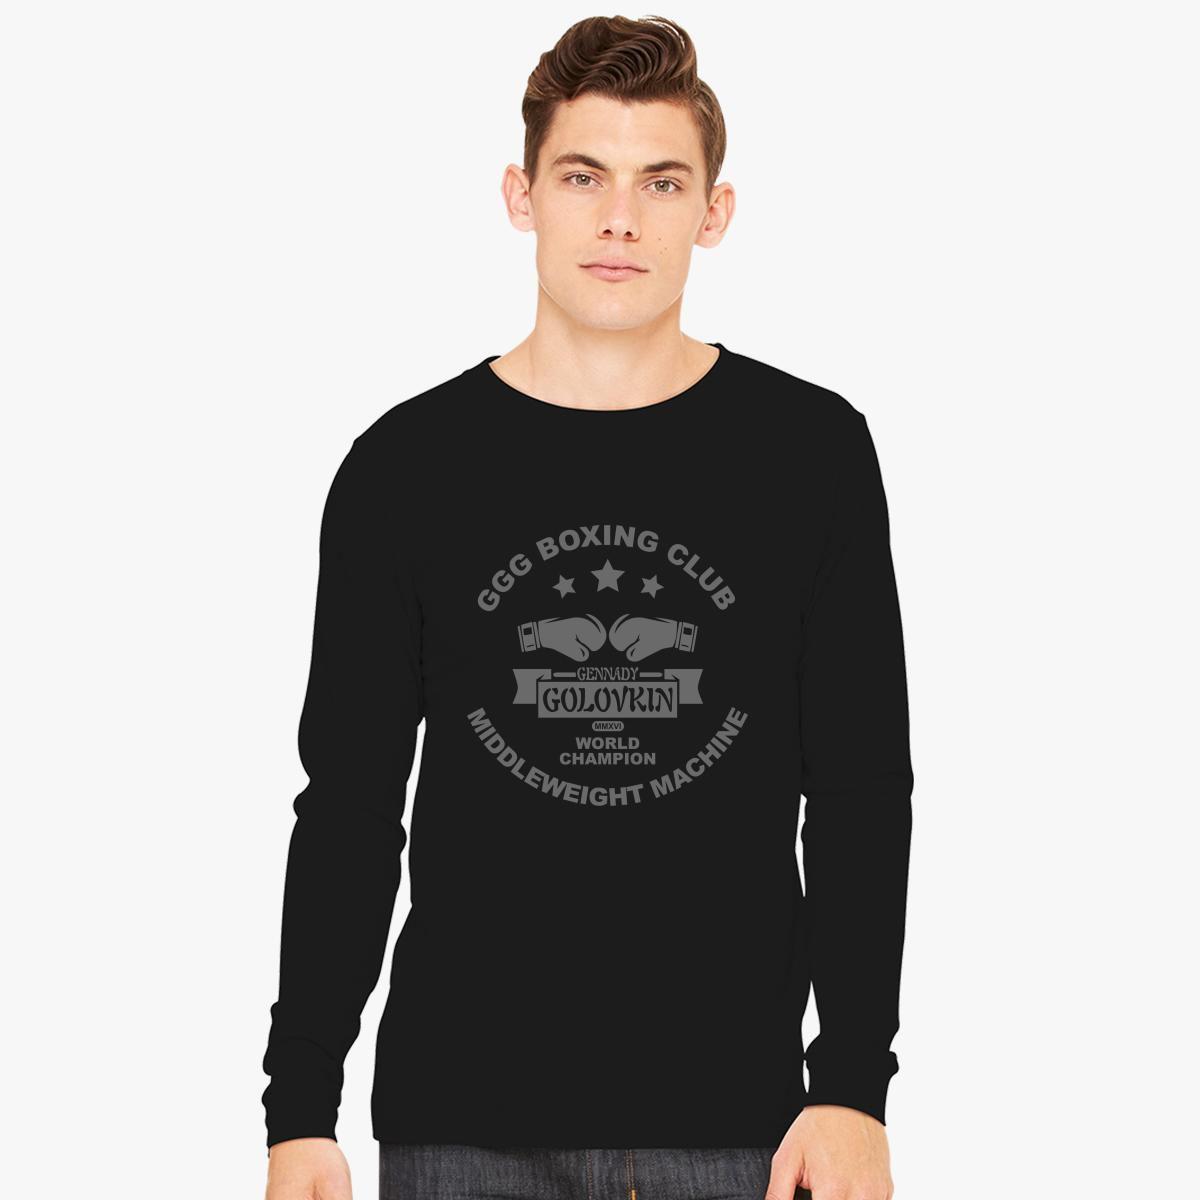 88f3f6cd2af GGG Boxing Club Long Sleeve T-shirt - Customon